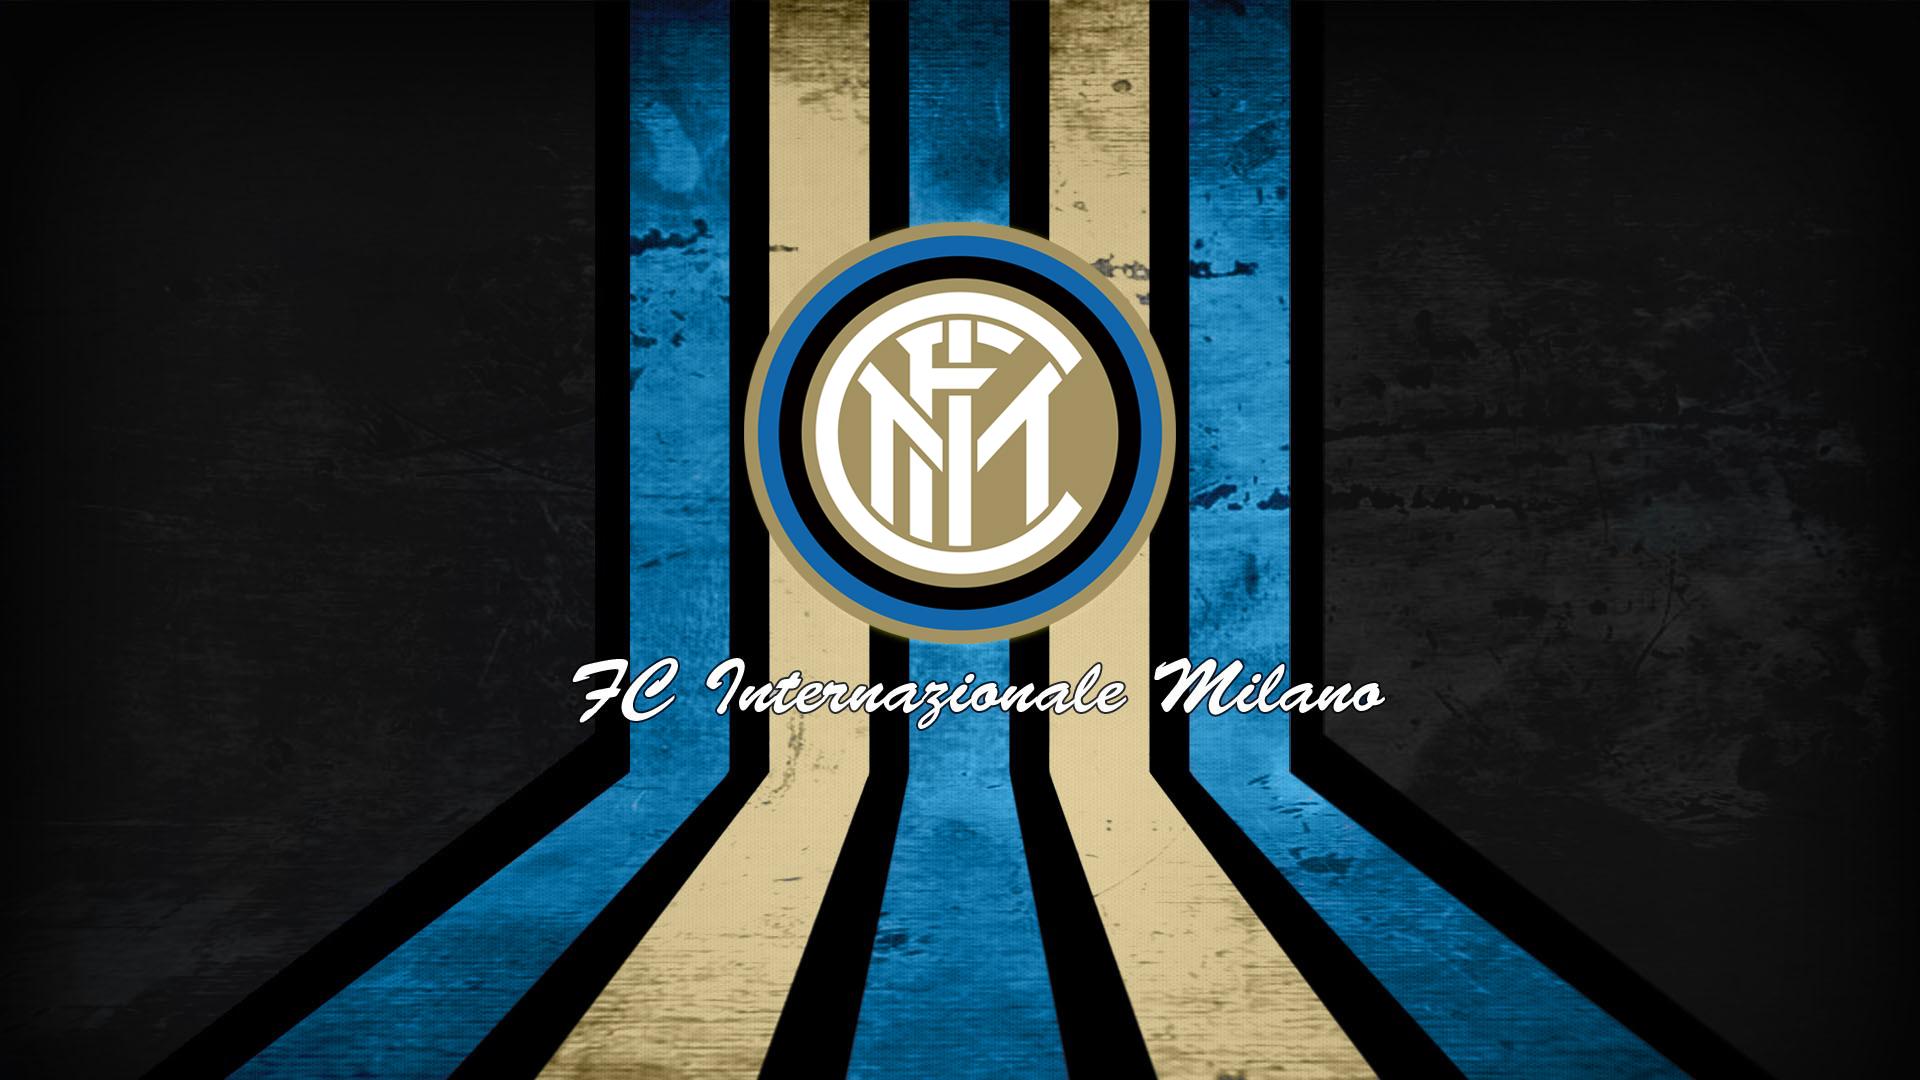 Inter Milan Wallpaper By Fcinternazionale On Deviantart